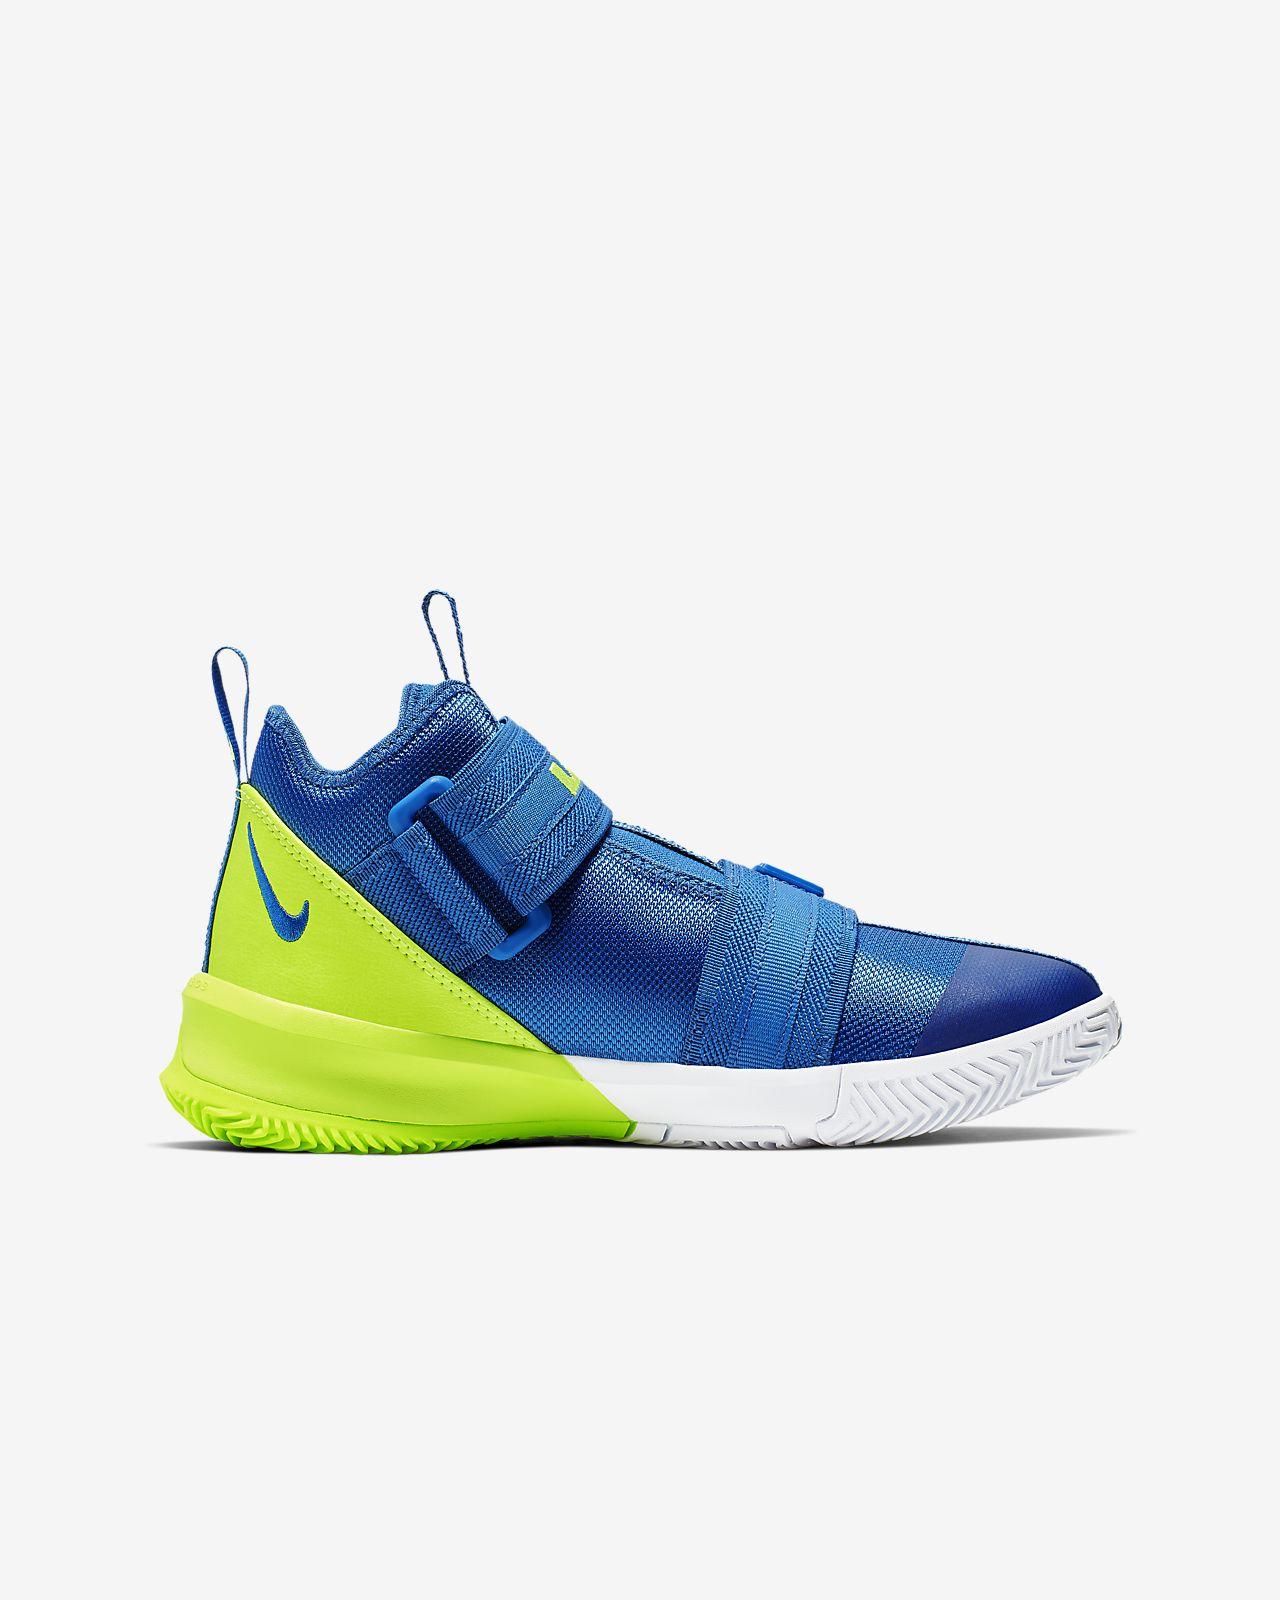 e30d174e6f1a2 LeBron Soldier 13 Big Kids' Basketball Shoe. Nike.com